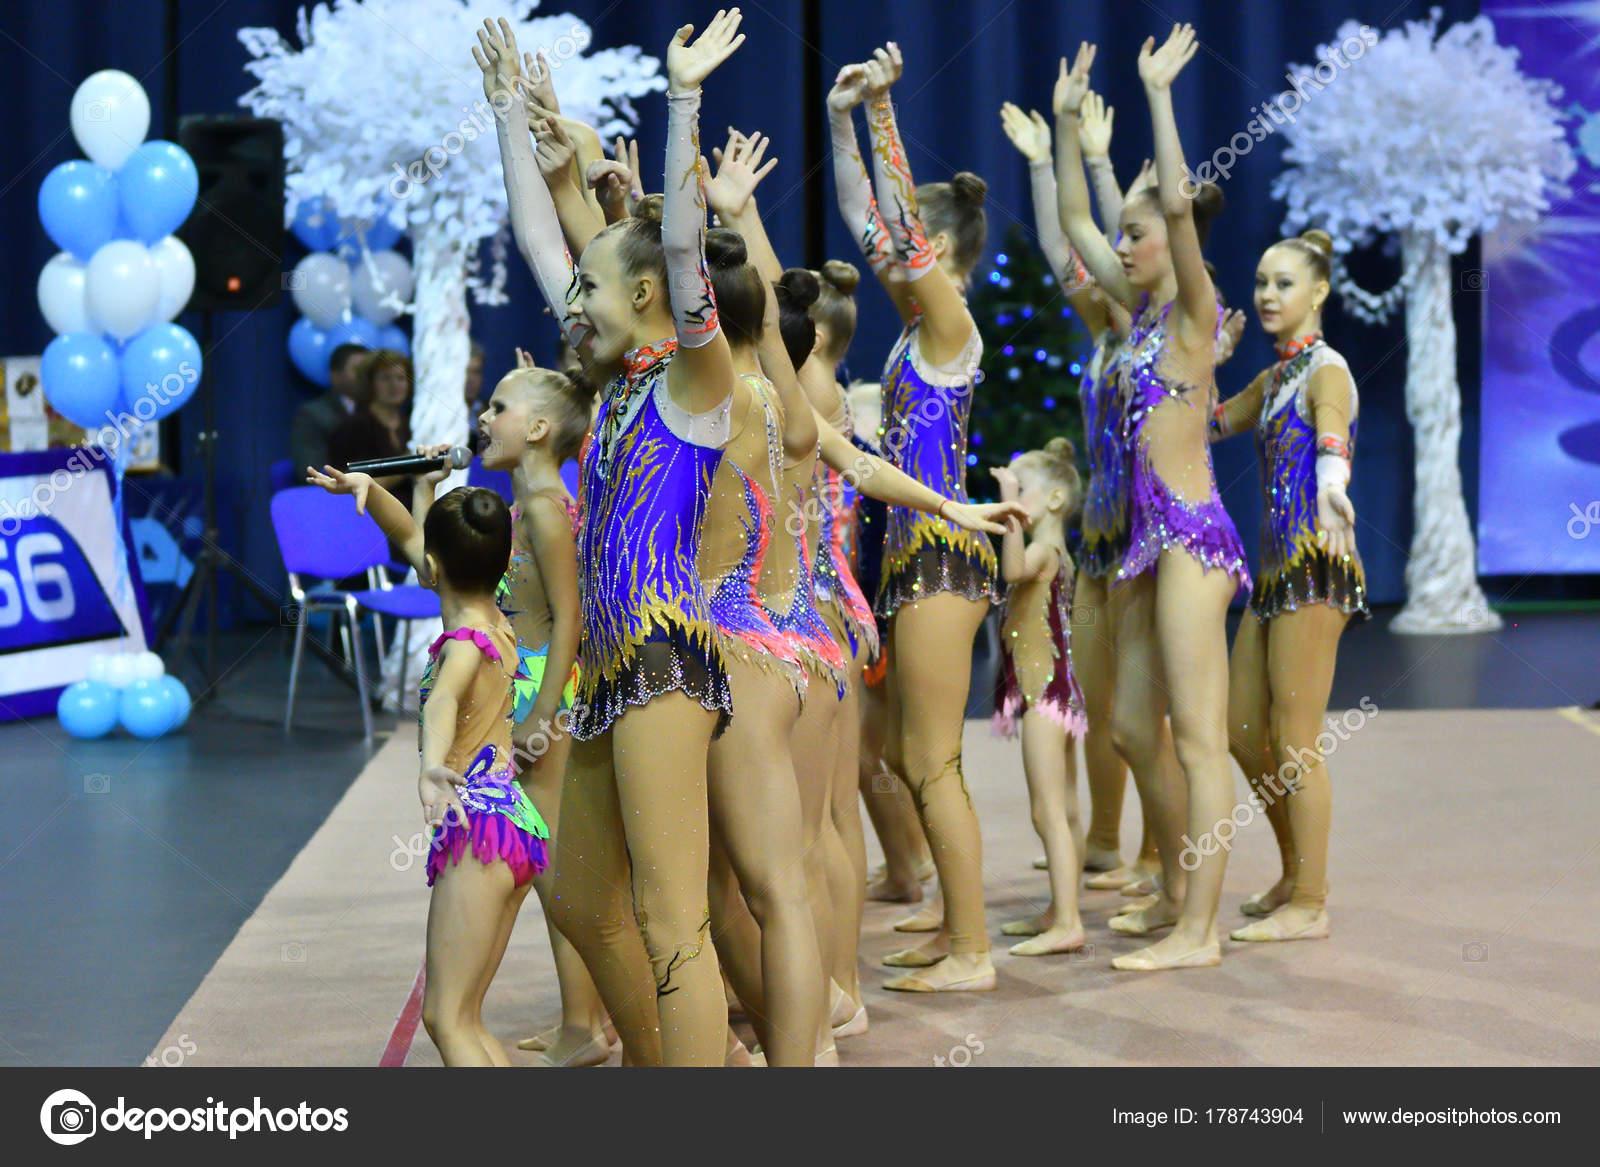 Orenburg, Russia - November 25, 2017 year: girls compete in rhythmic